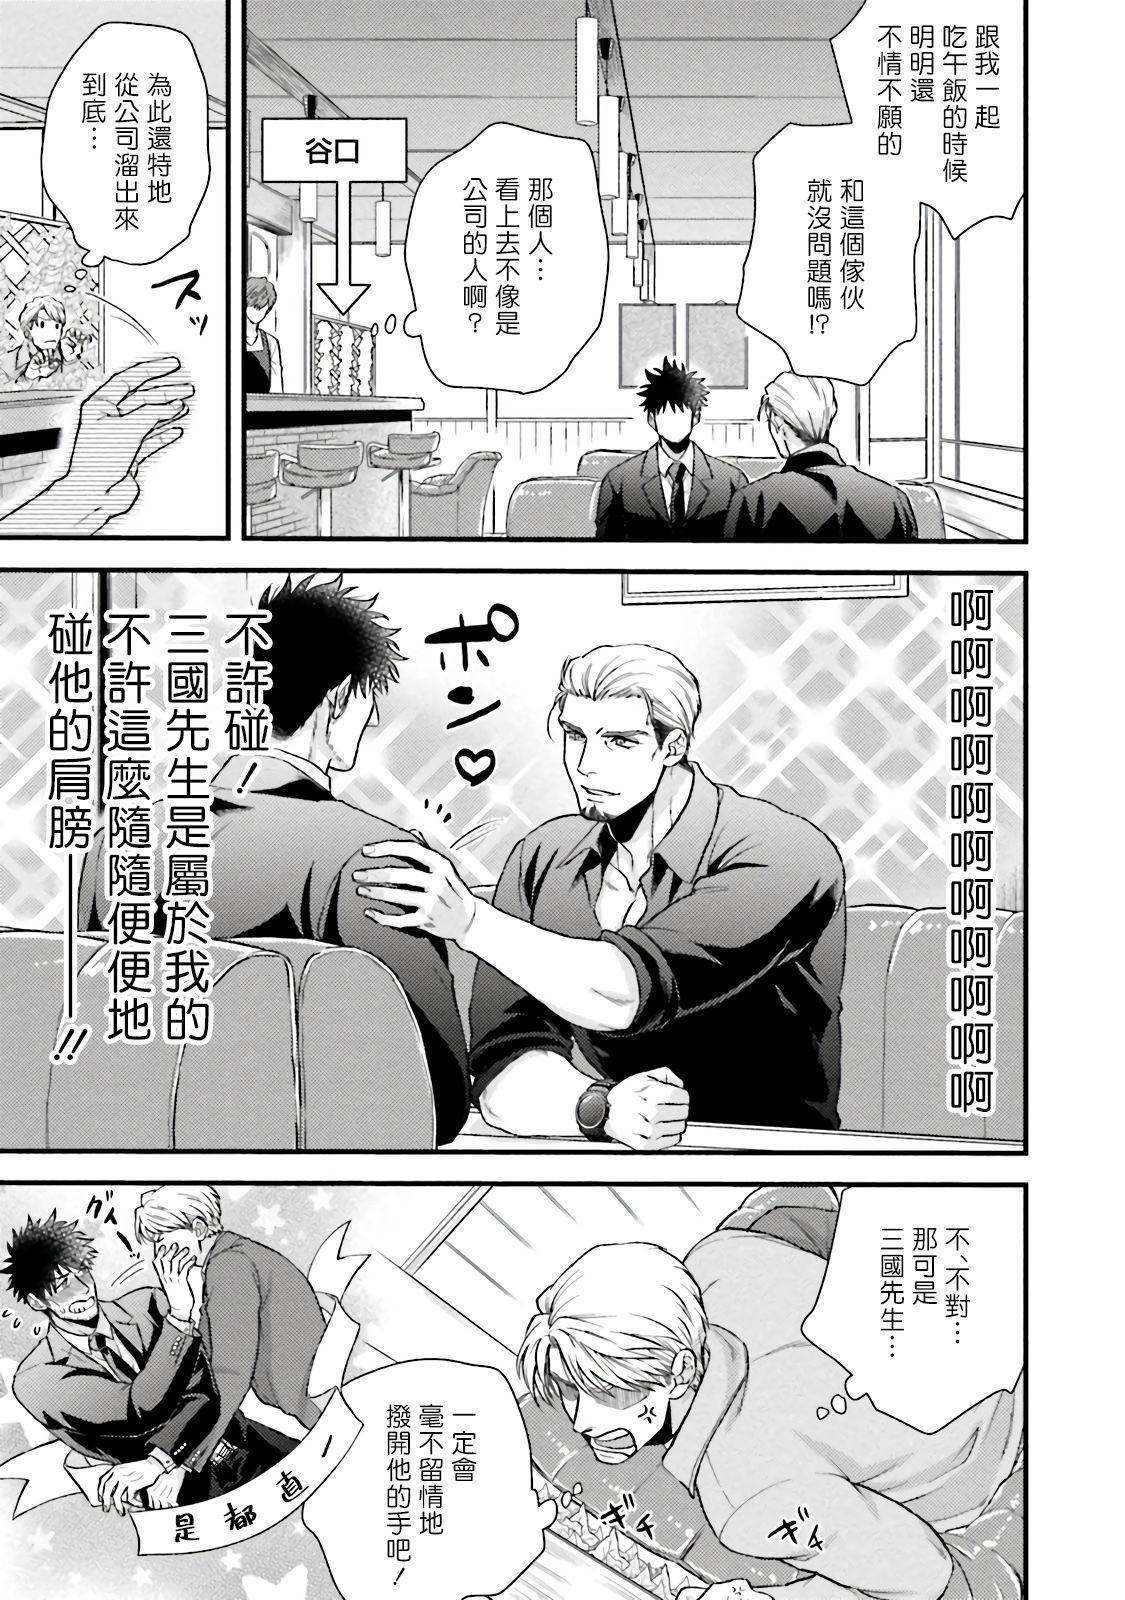 Kinou wa Otanoshimi Deshita ne | 昨天过得很愉快吧 Ch. 1-4+特典 147